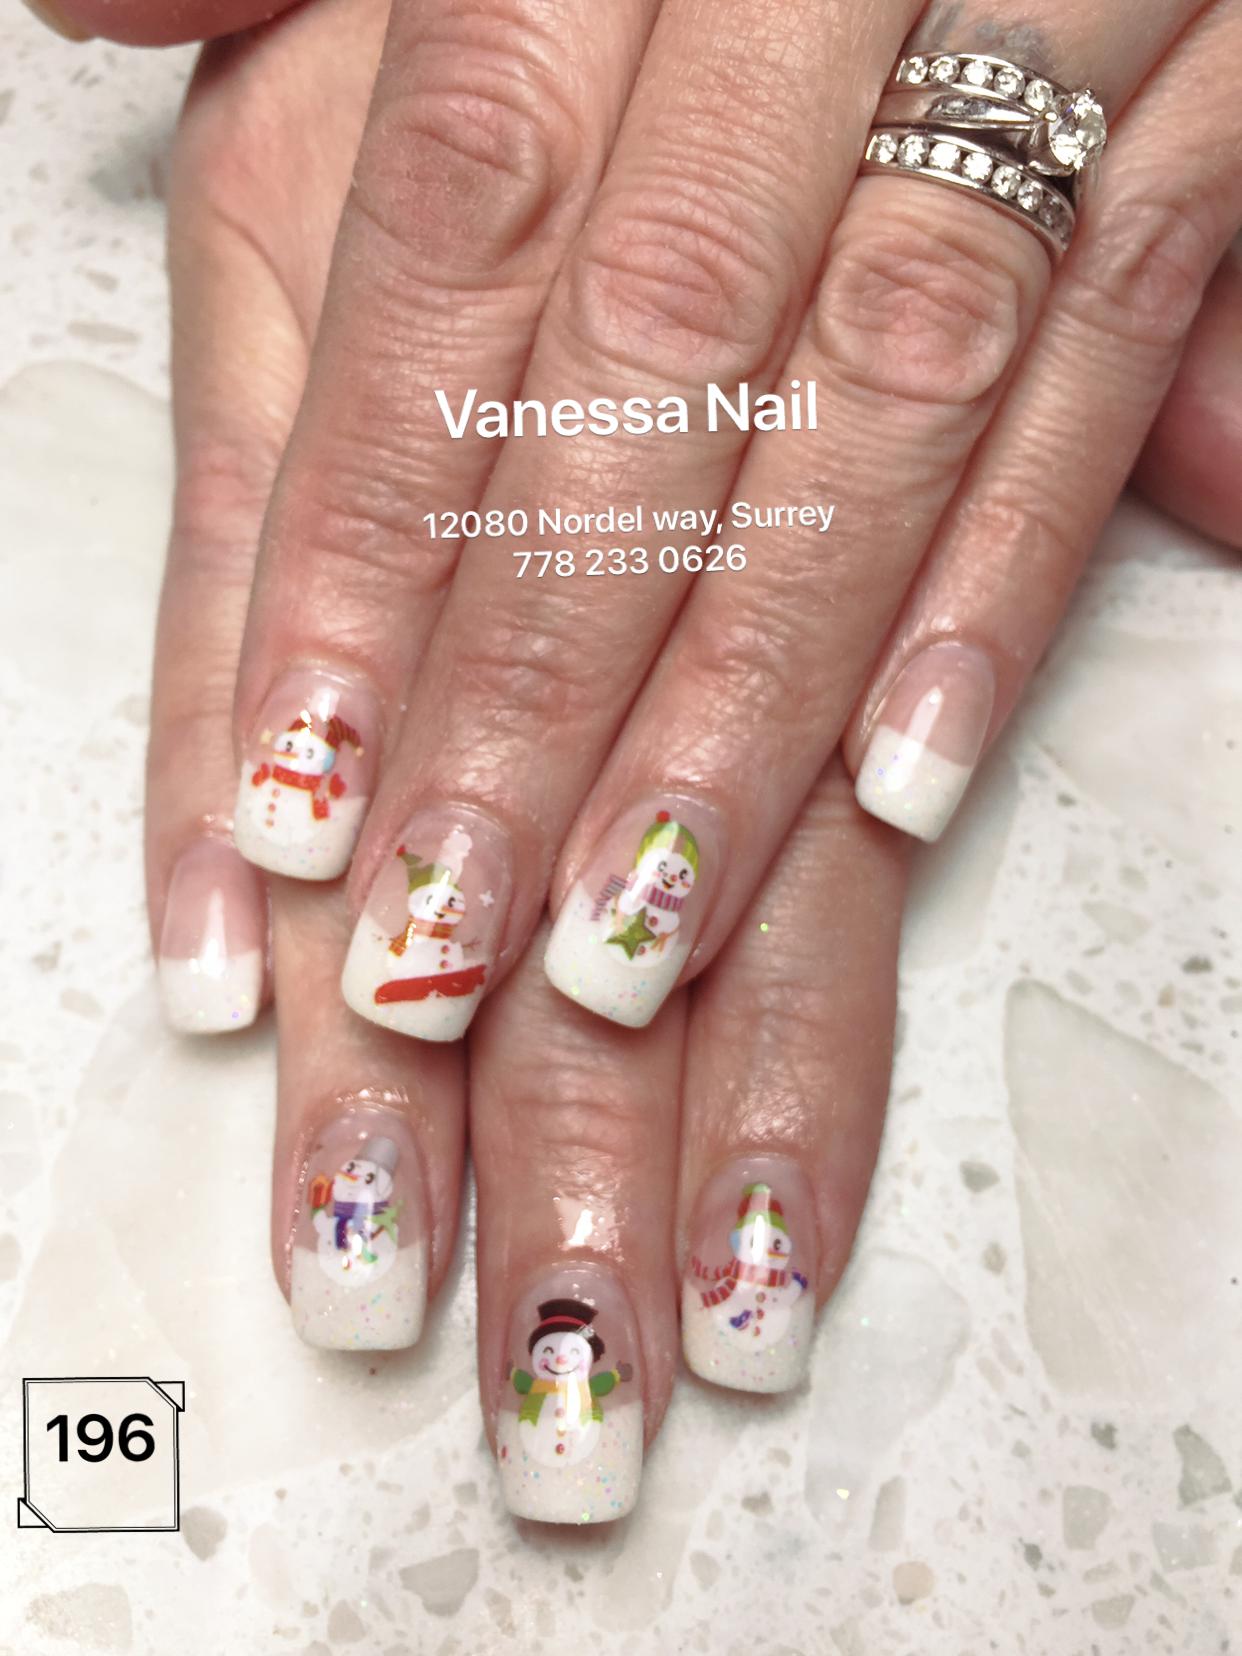 Vanessa Nail Spa Nail Salon Open In Surrey Near Me Surrey Bc Vanessa Nails Nail Spa Nails